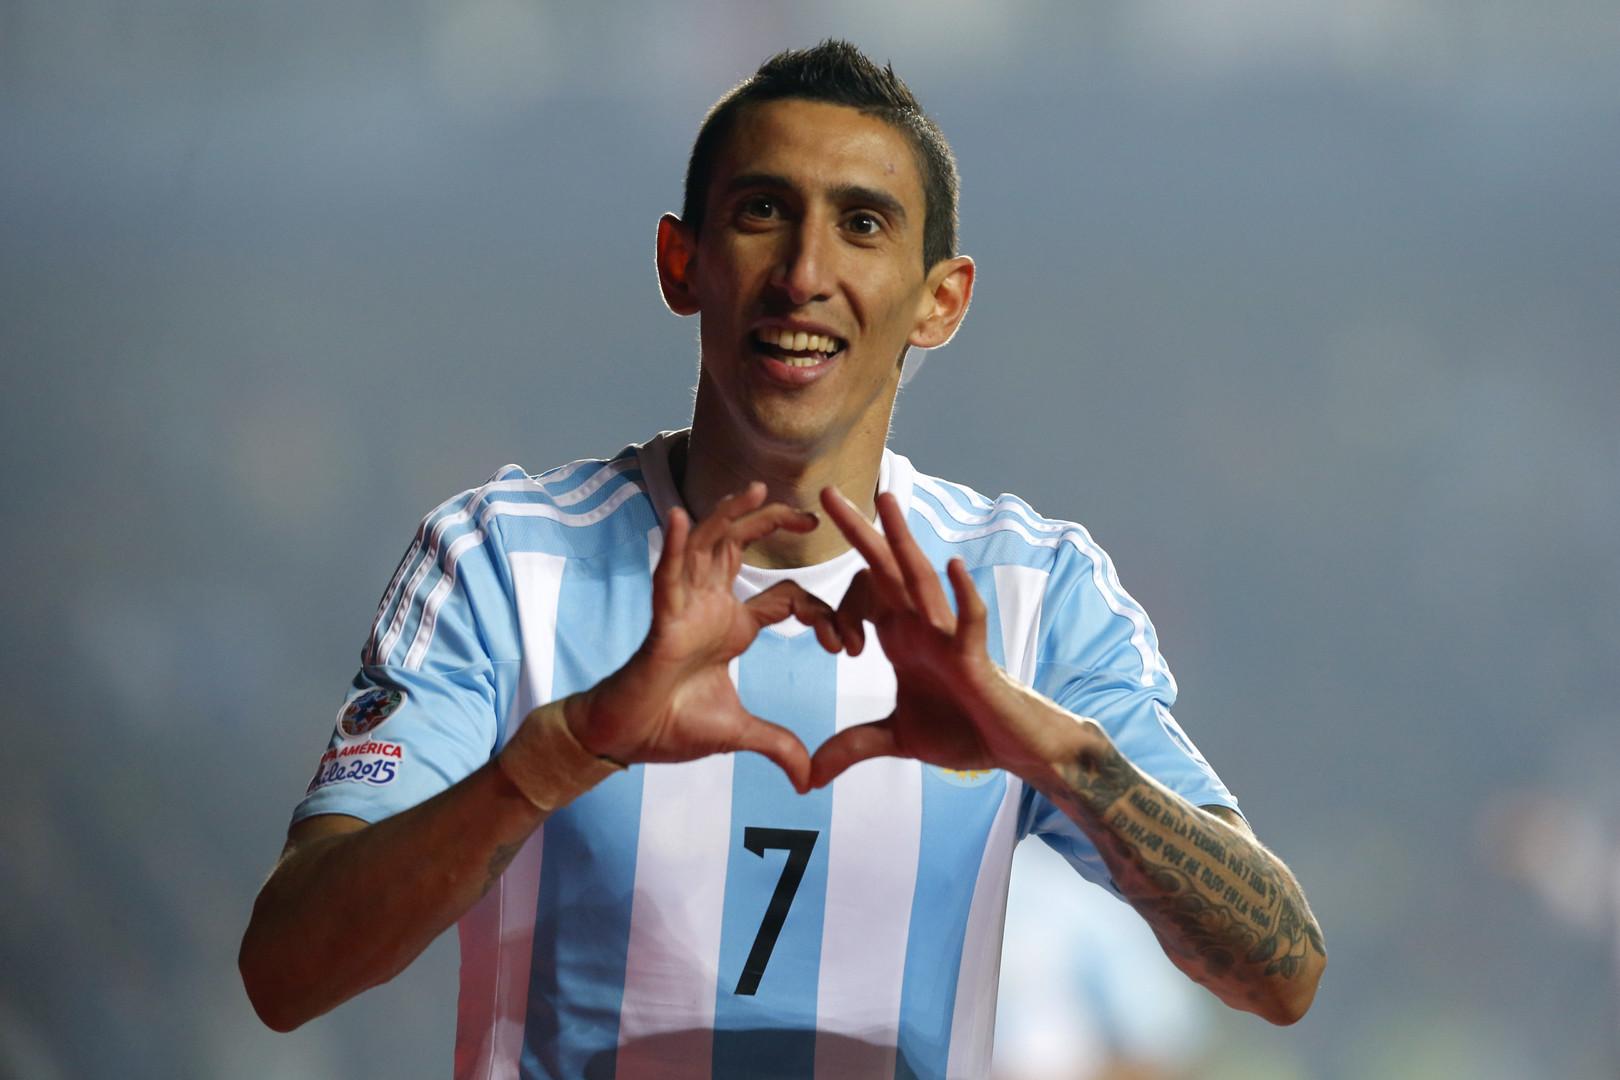 دي ماريا سجل هدفين في شباك باراغواي